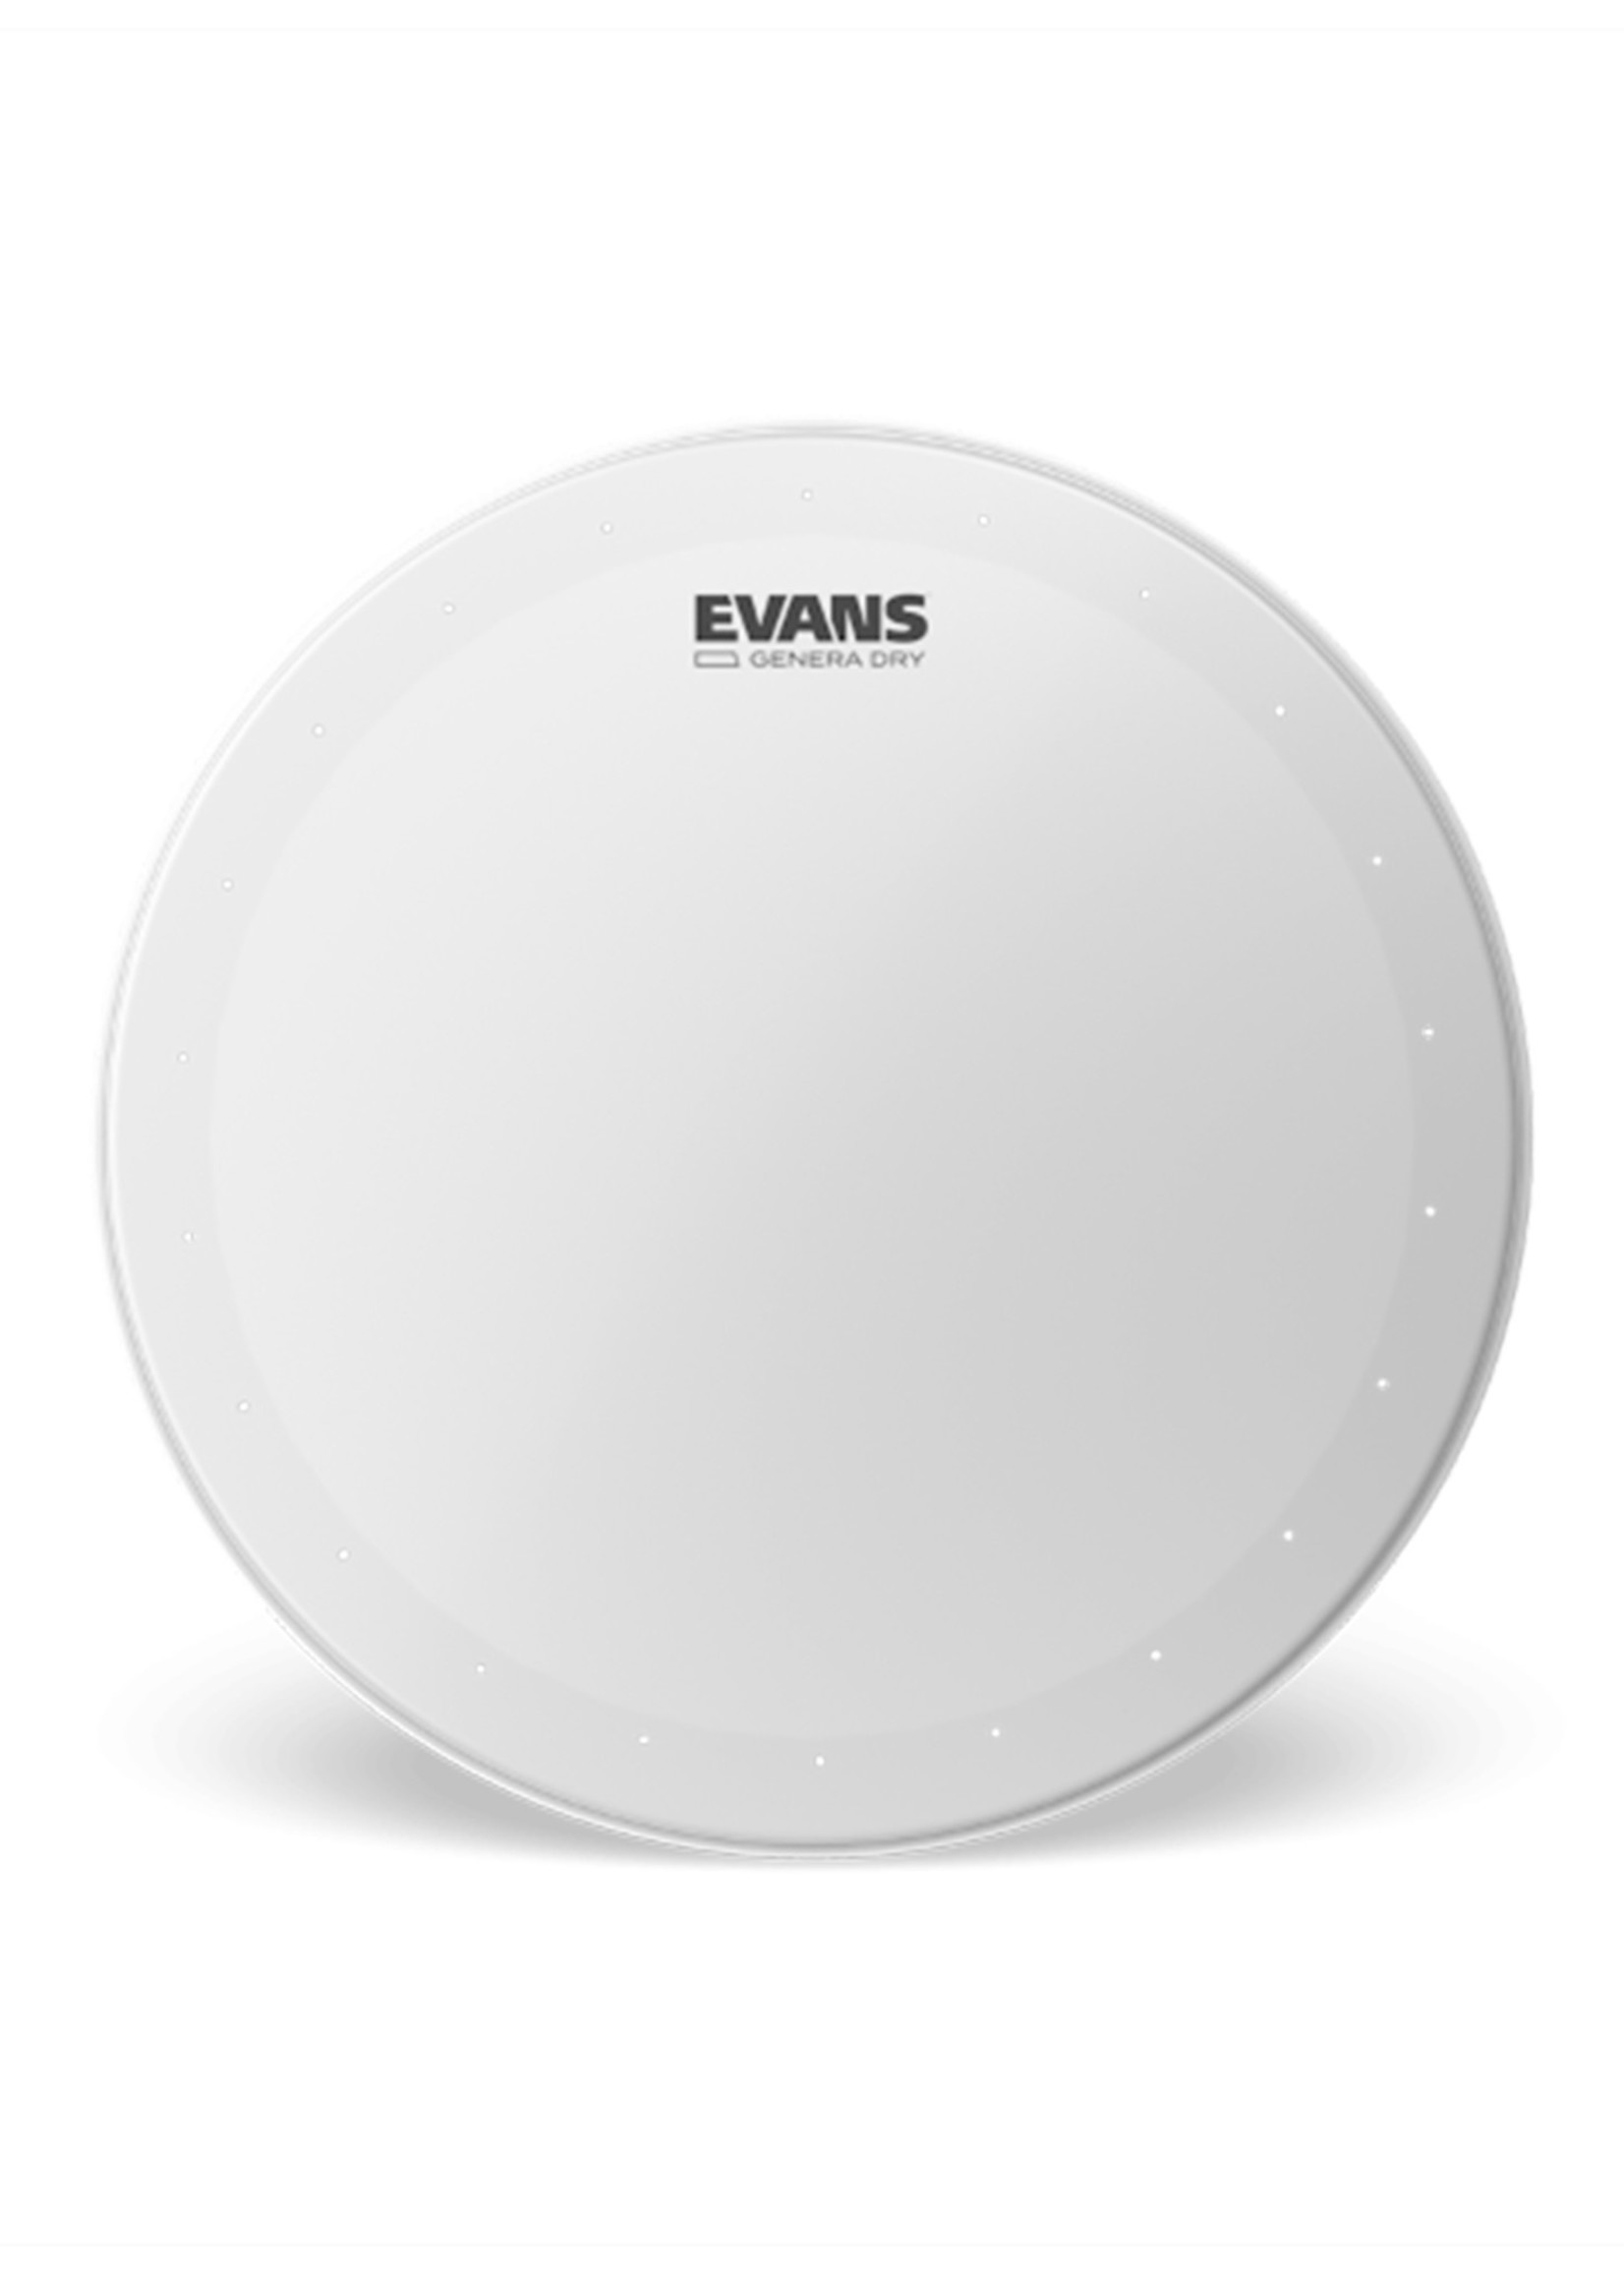 Evans Evans Genera Dry